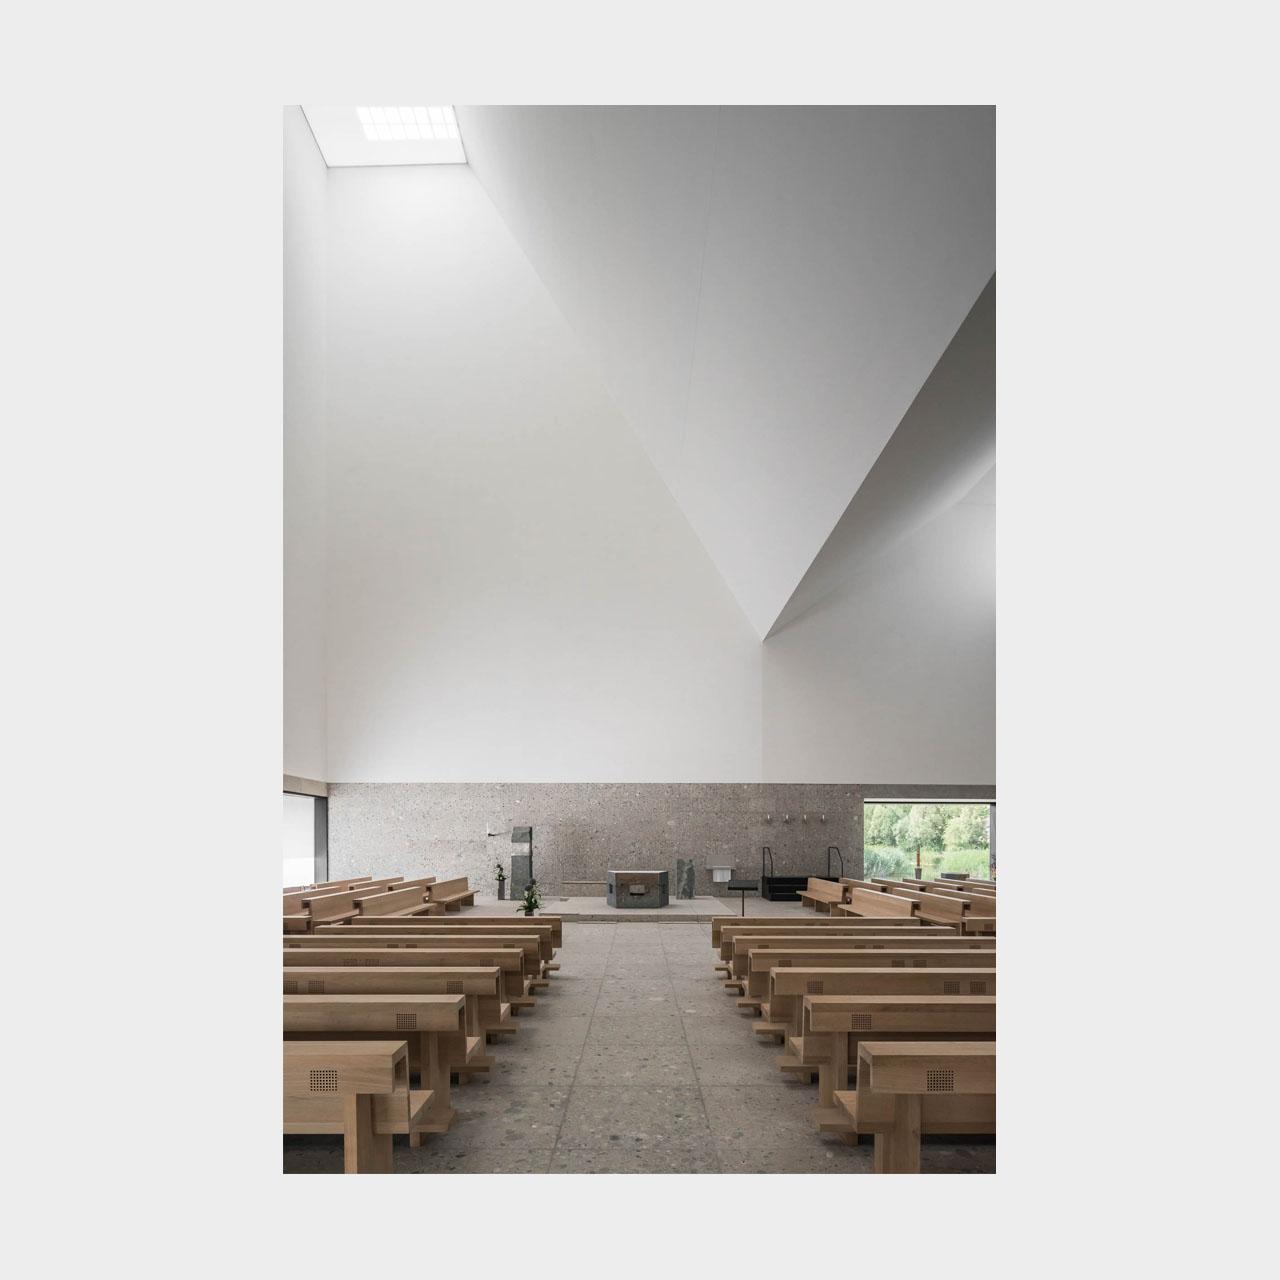 Architekturfotografie Pfarrkirche Seliger Pater Rupert Mayer Poing